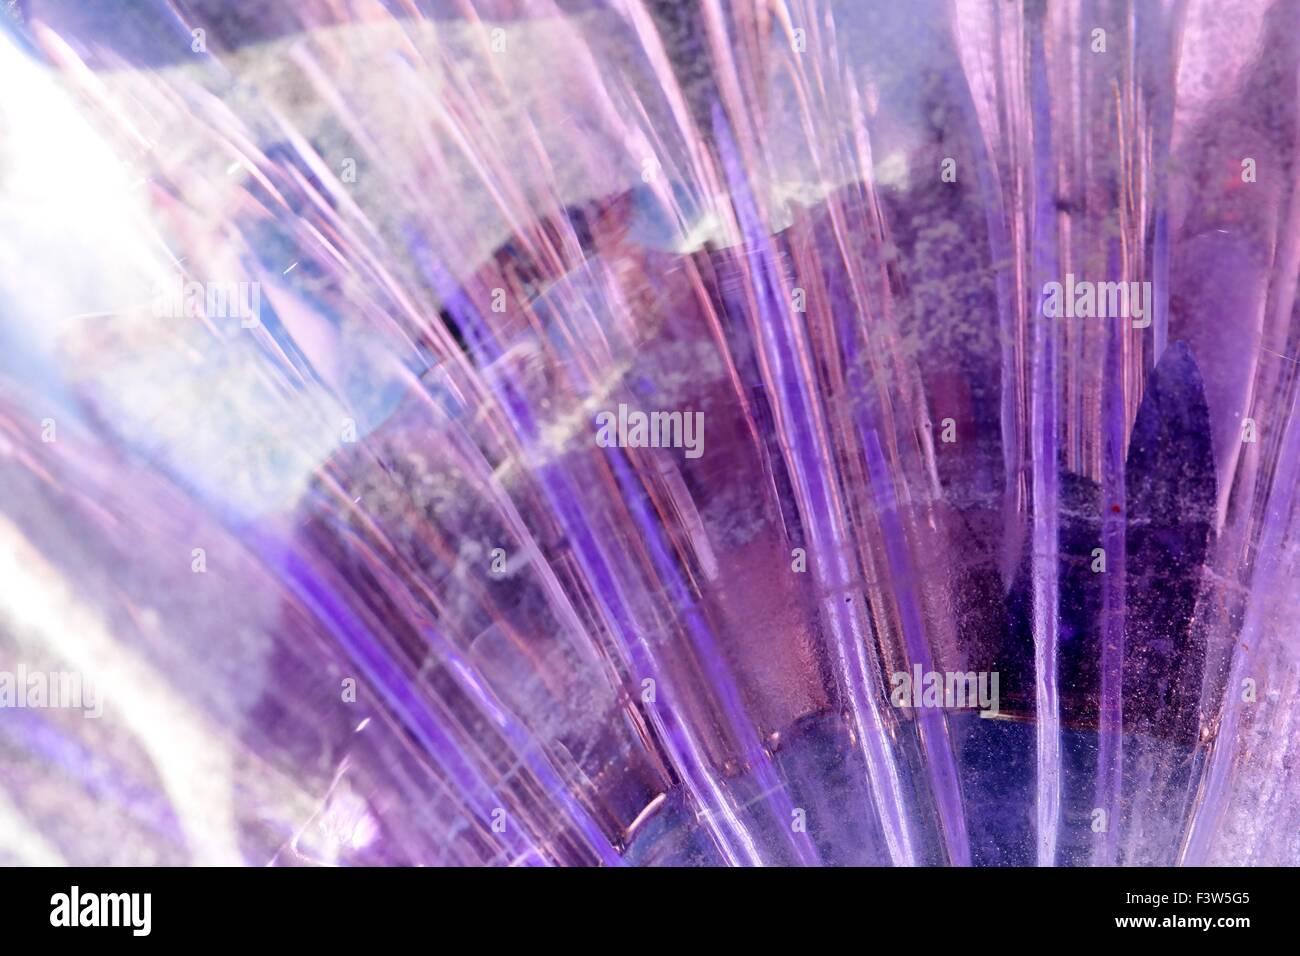 Cracked glass background - Stock Image